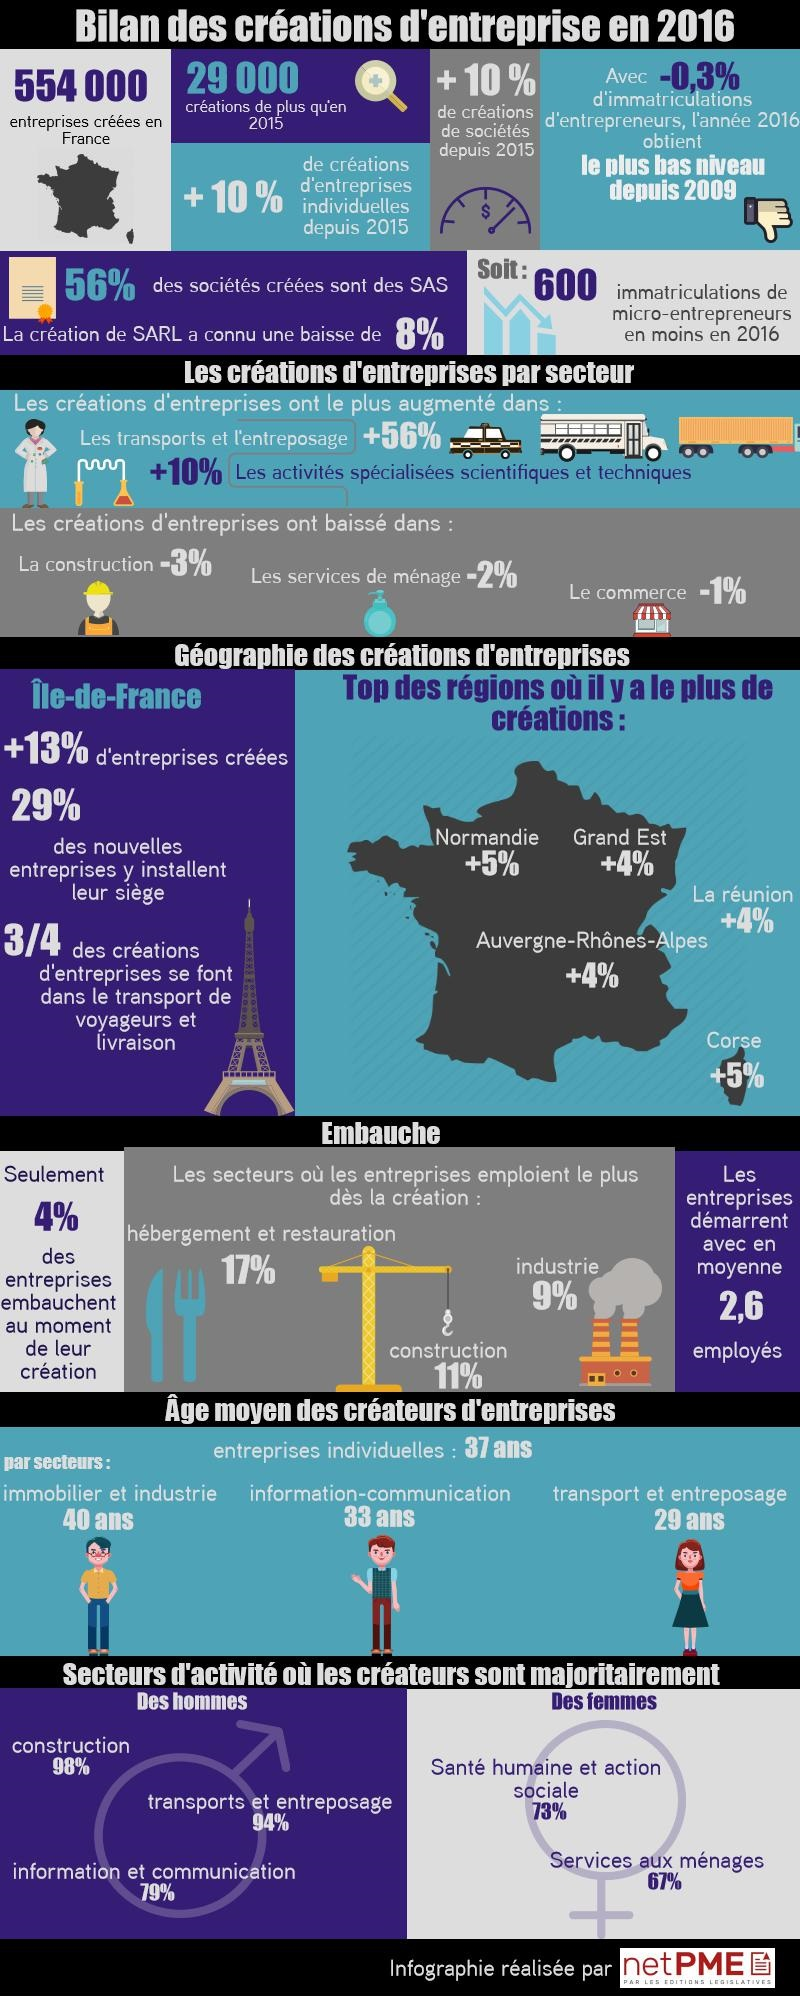 infographie-netpm-bilan-2016-créations-entreprisesinfographie-netpm-bilan-2016-créations-entreprises